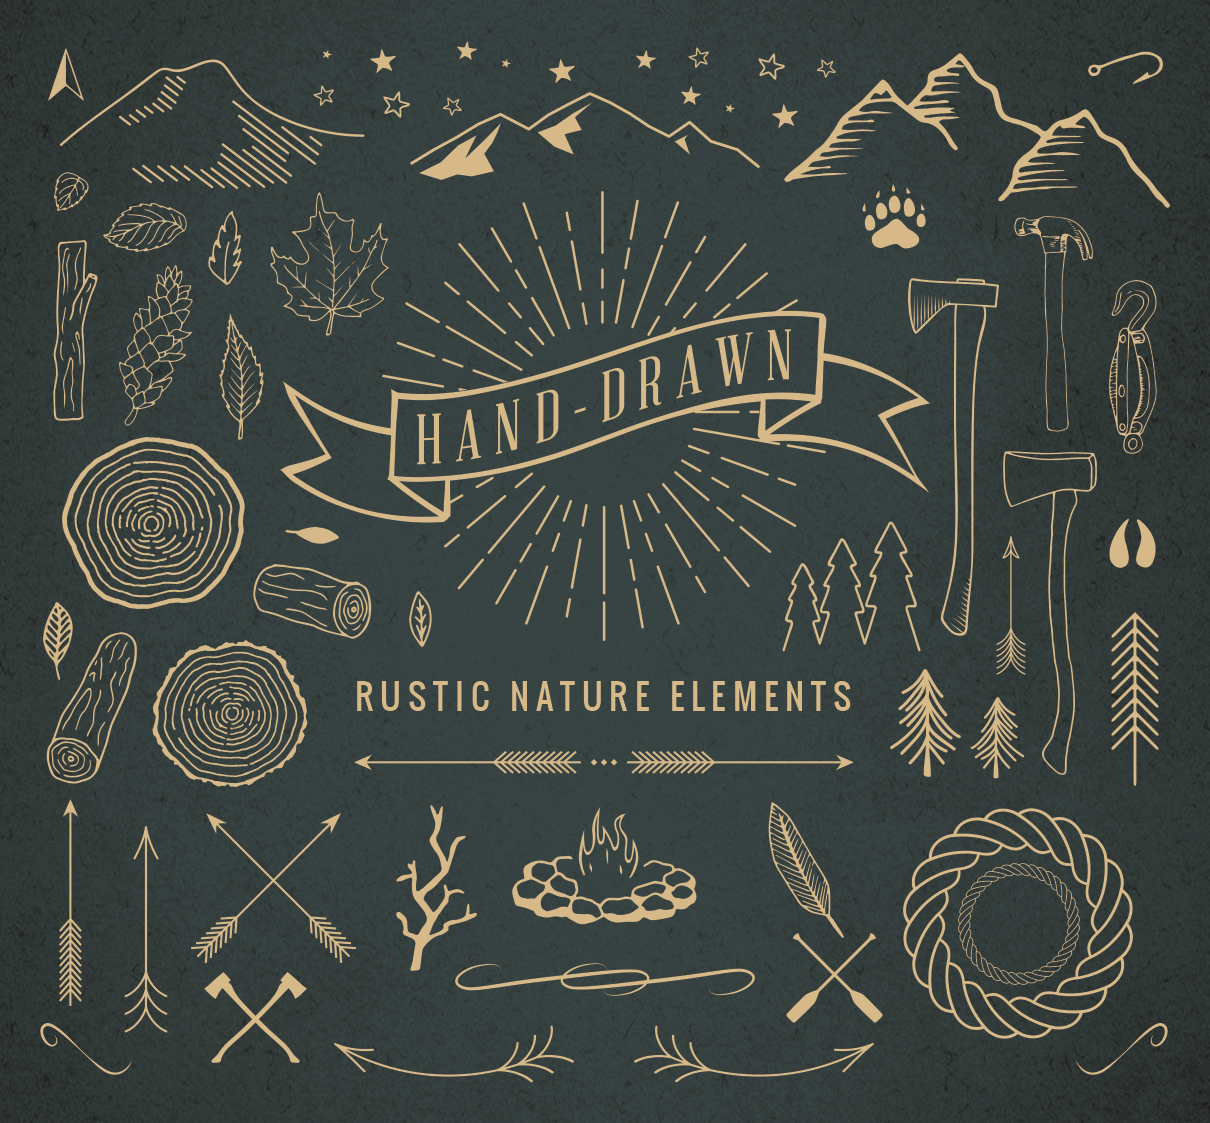 Nature Hand Drawing Hand-drawn Rustic Nature